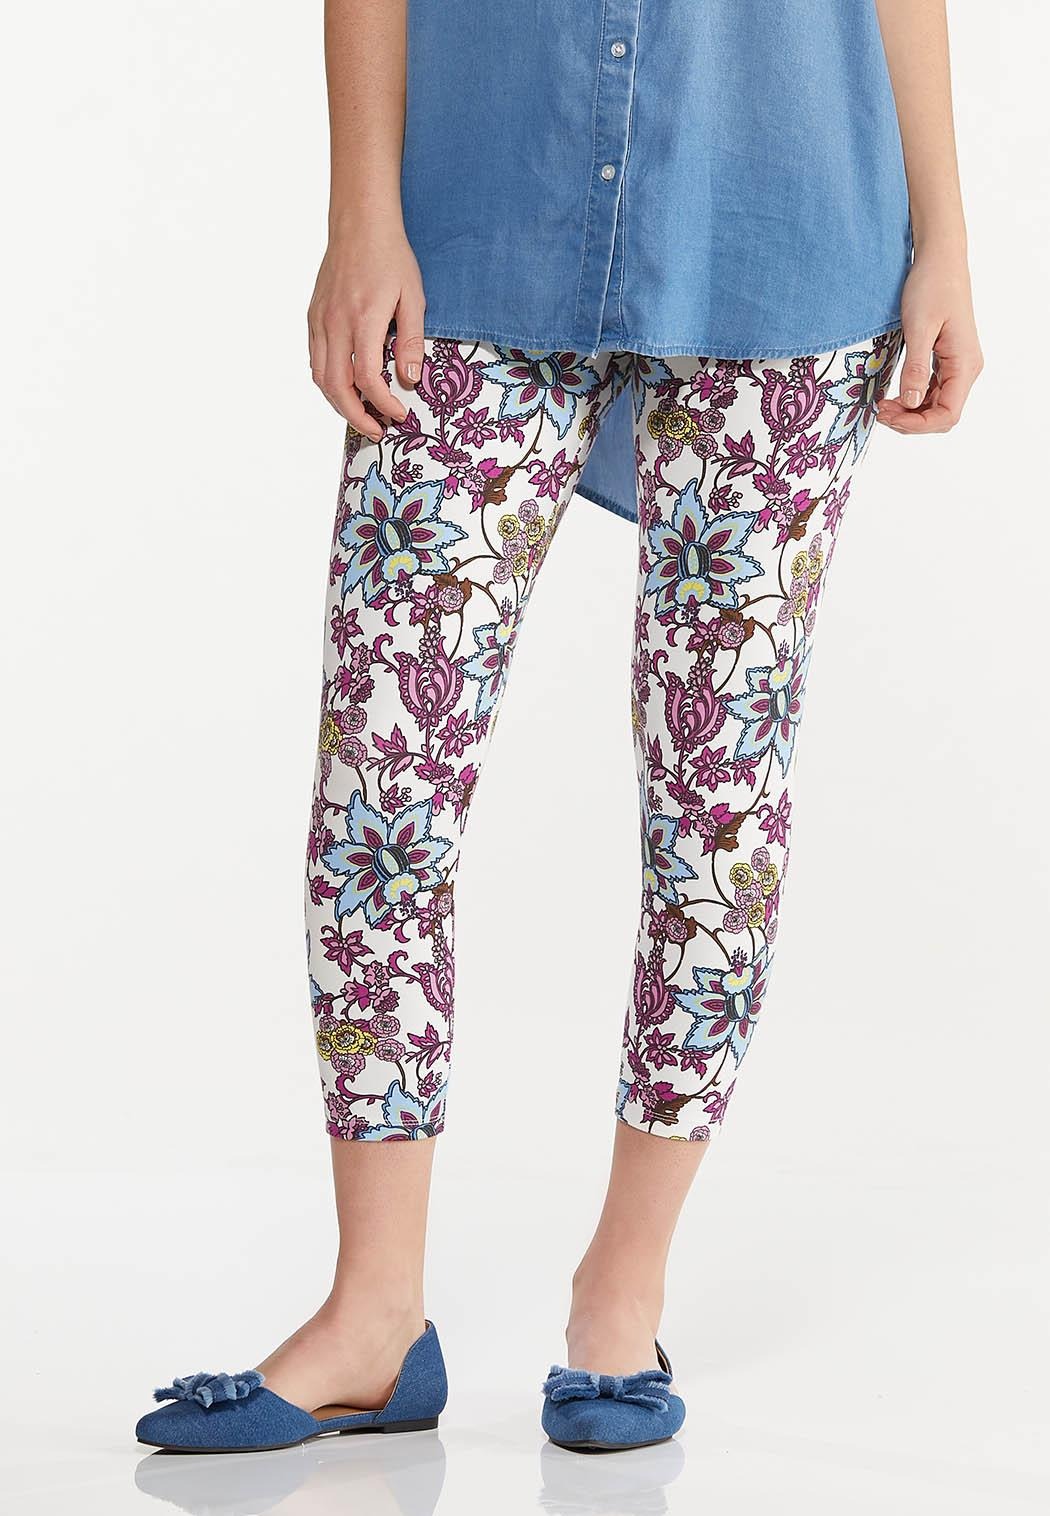 Cropped Purple Floral Pants